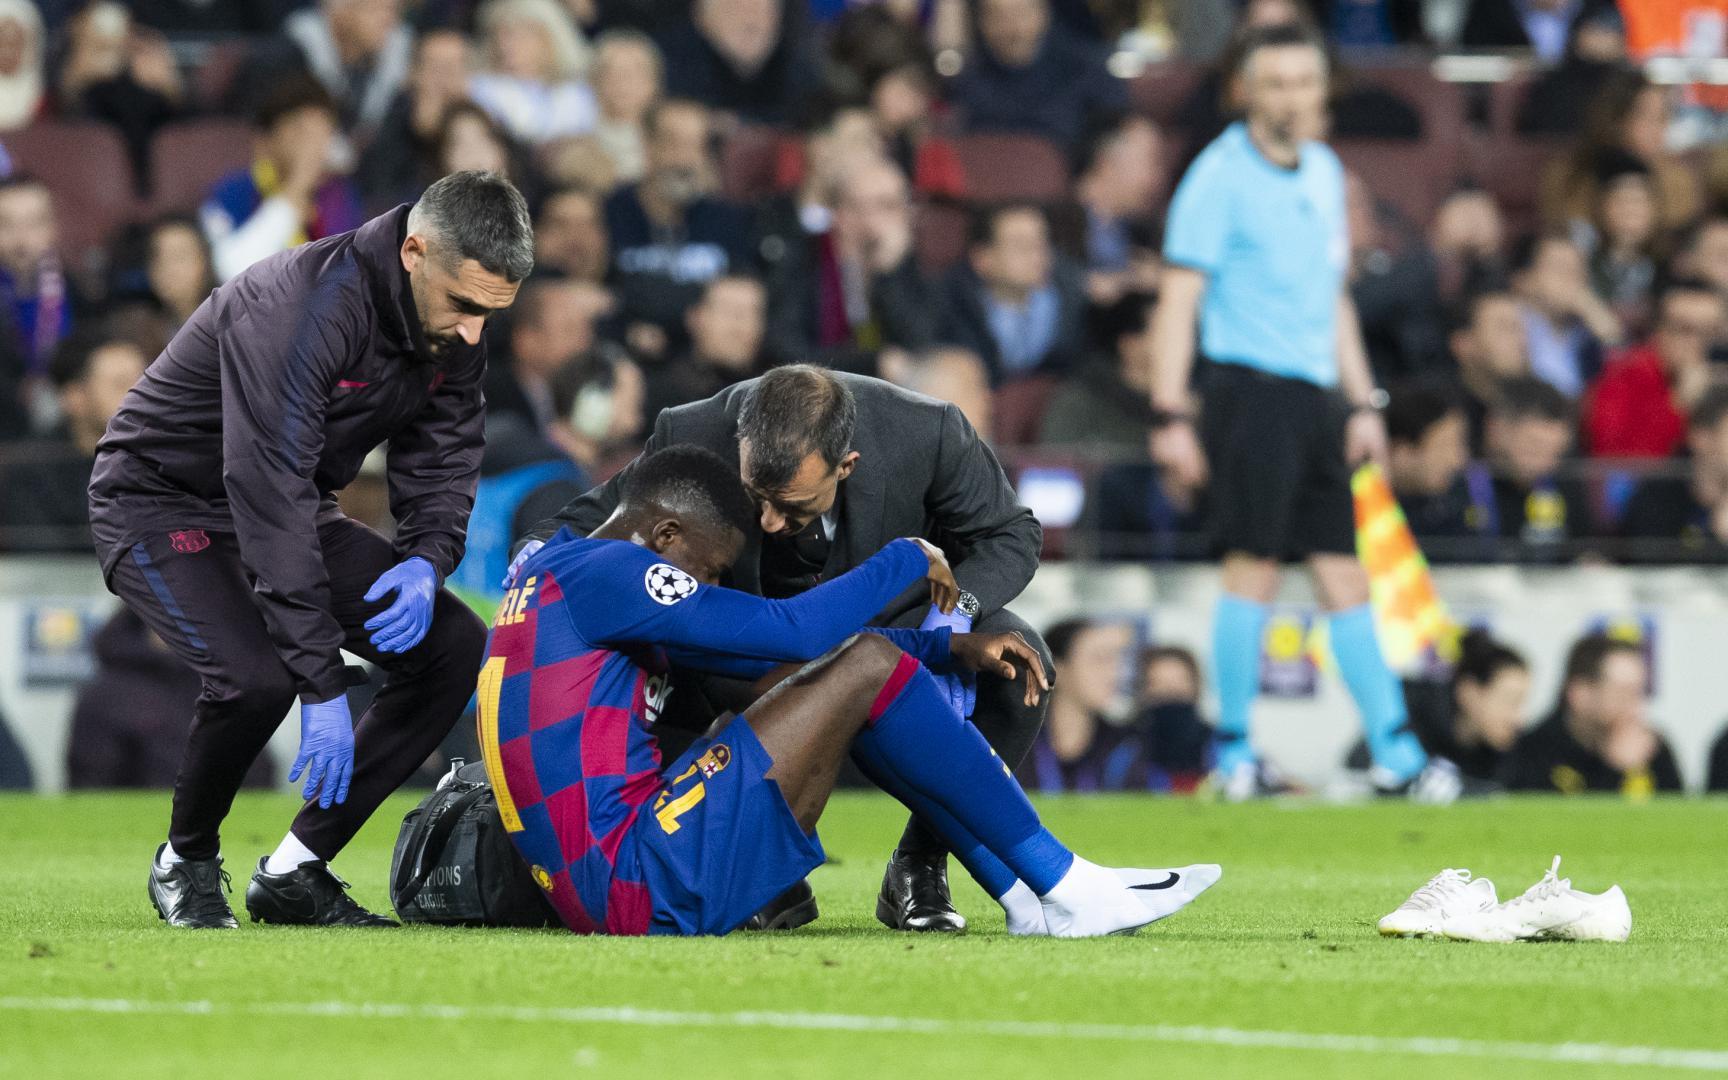 Ousmane Dembélé set to miss approximately 10 weeks